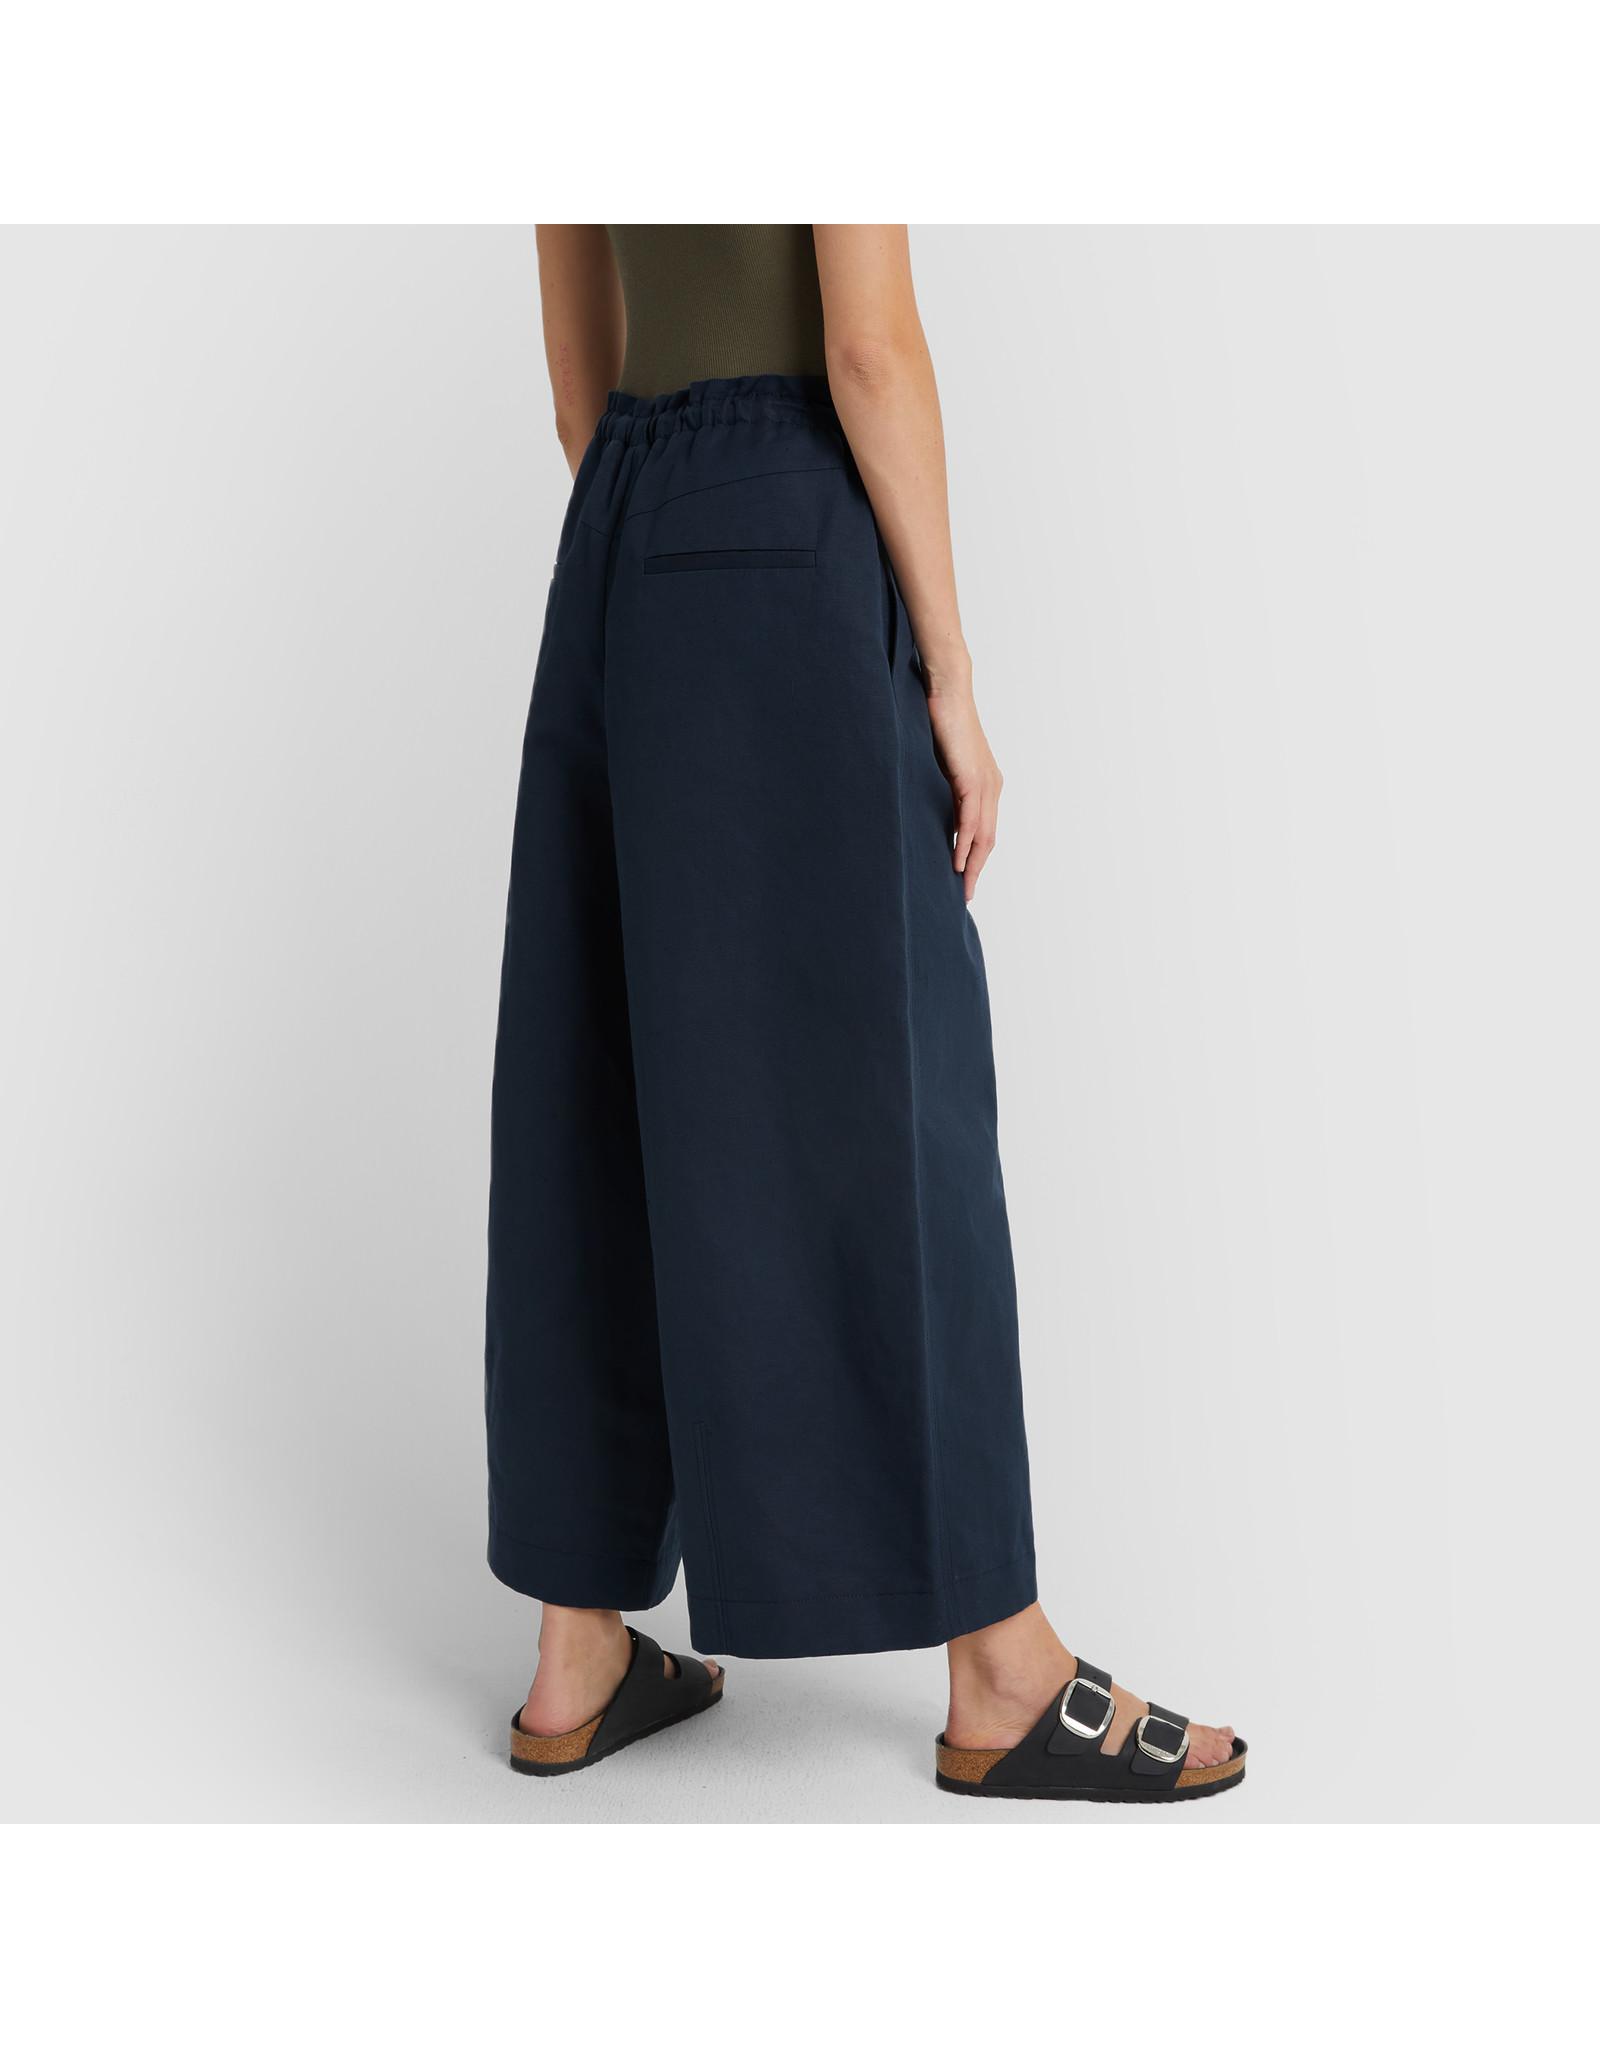 G. Label G. Label Dani Wide Leg Drawstring Pant (Color: Navy, Size: 4)